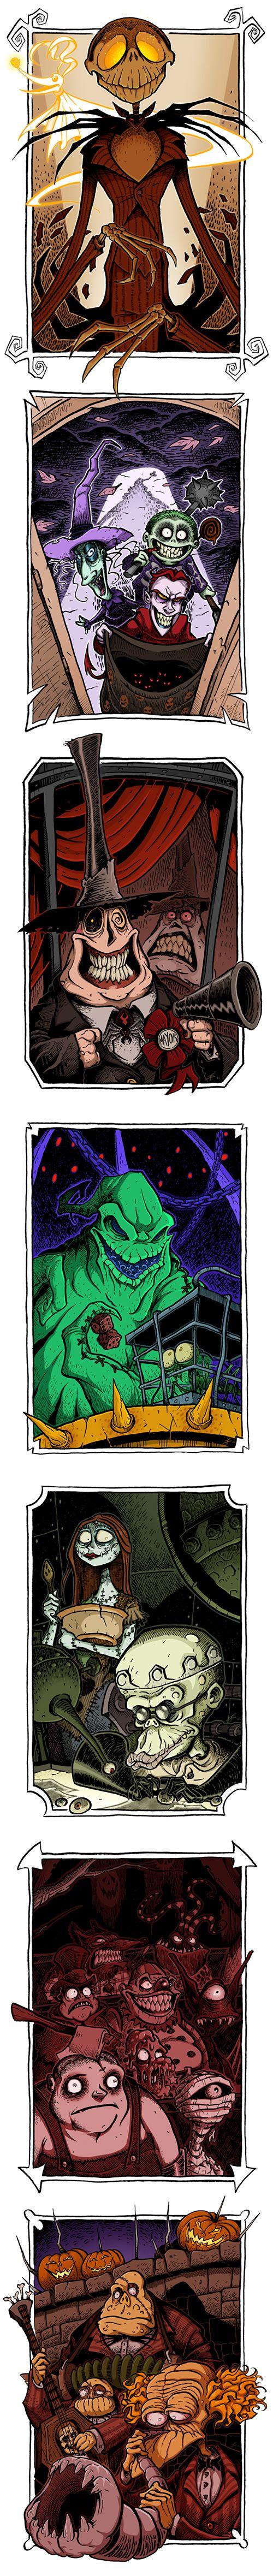 *JACK SKELLINGTON ~ Halloween Town series by boredman @deviantart